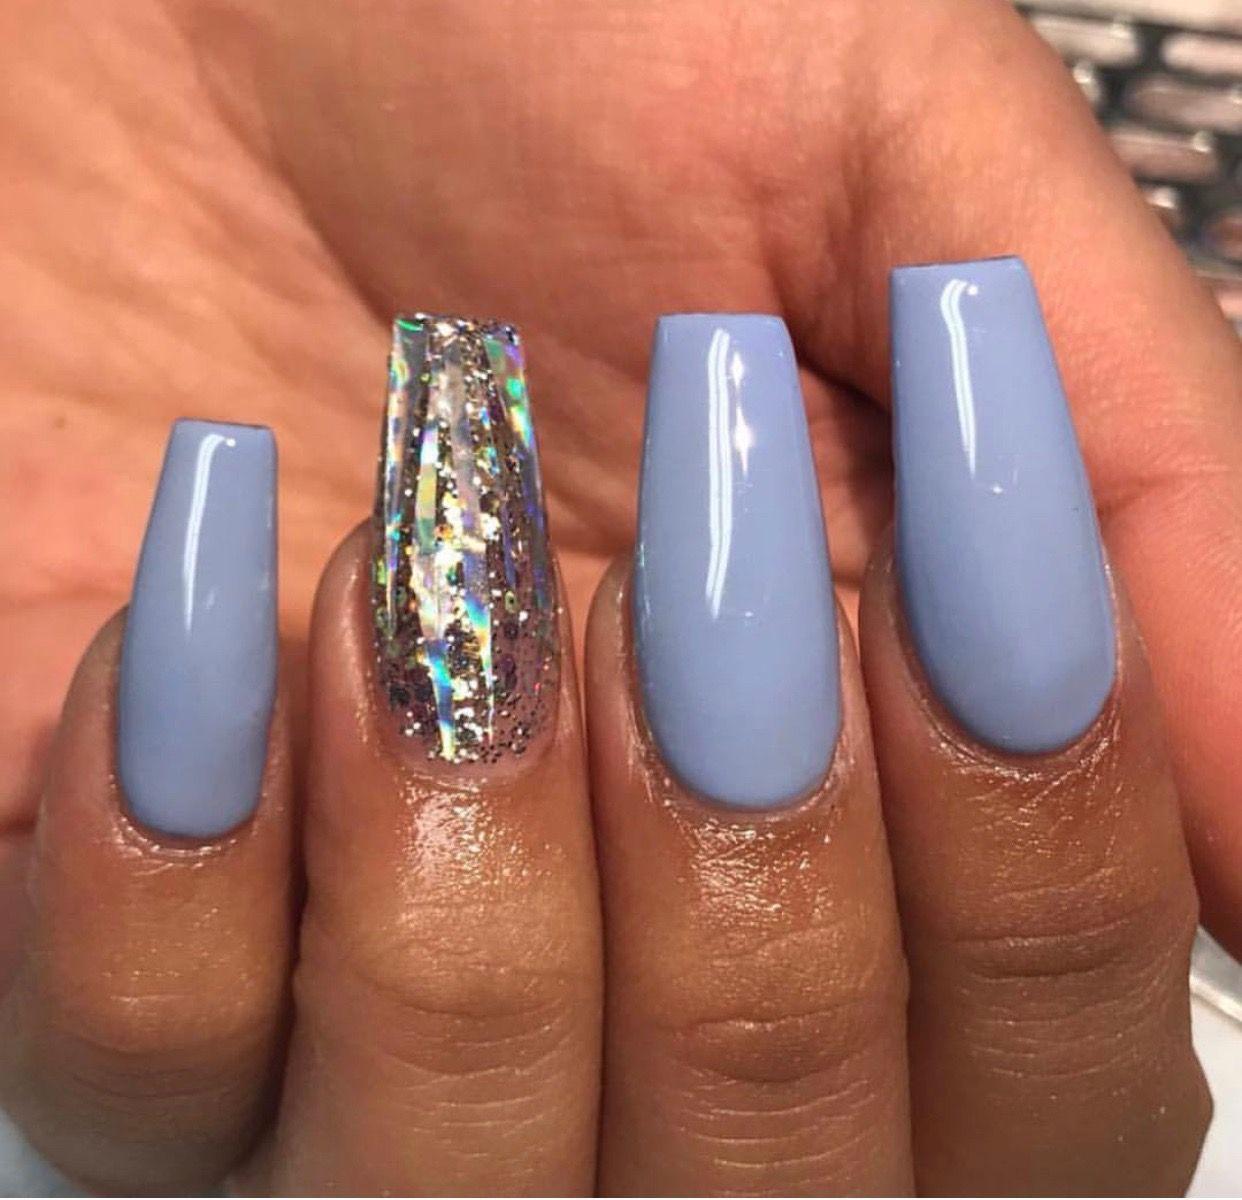 Pin de Mia Bowman en Nails | Pinterest | Diseños de uñas, Uñas ...